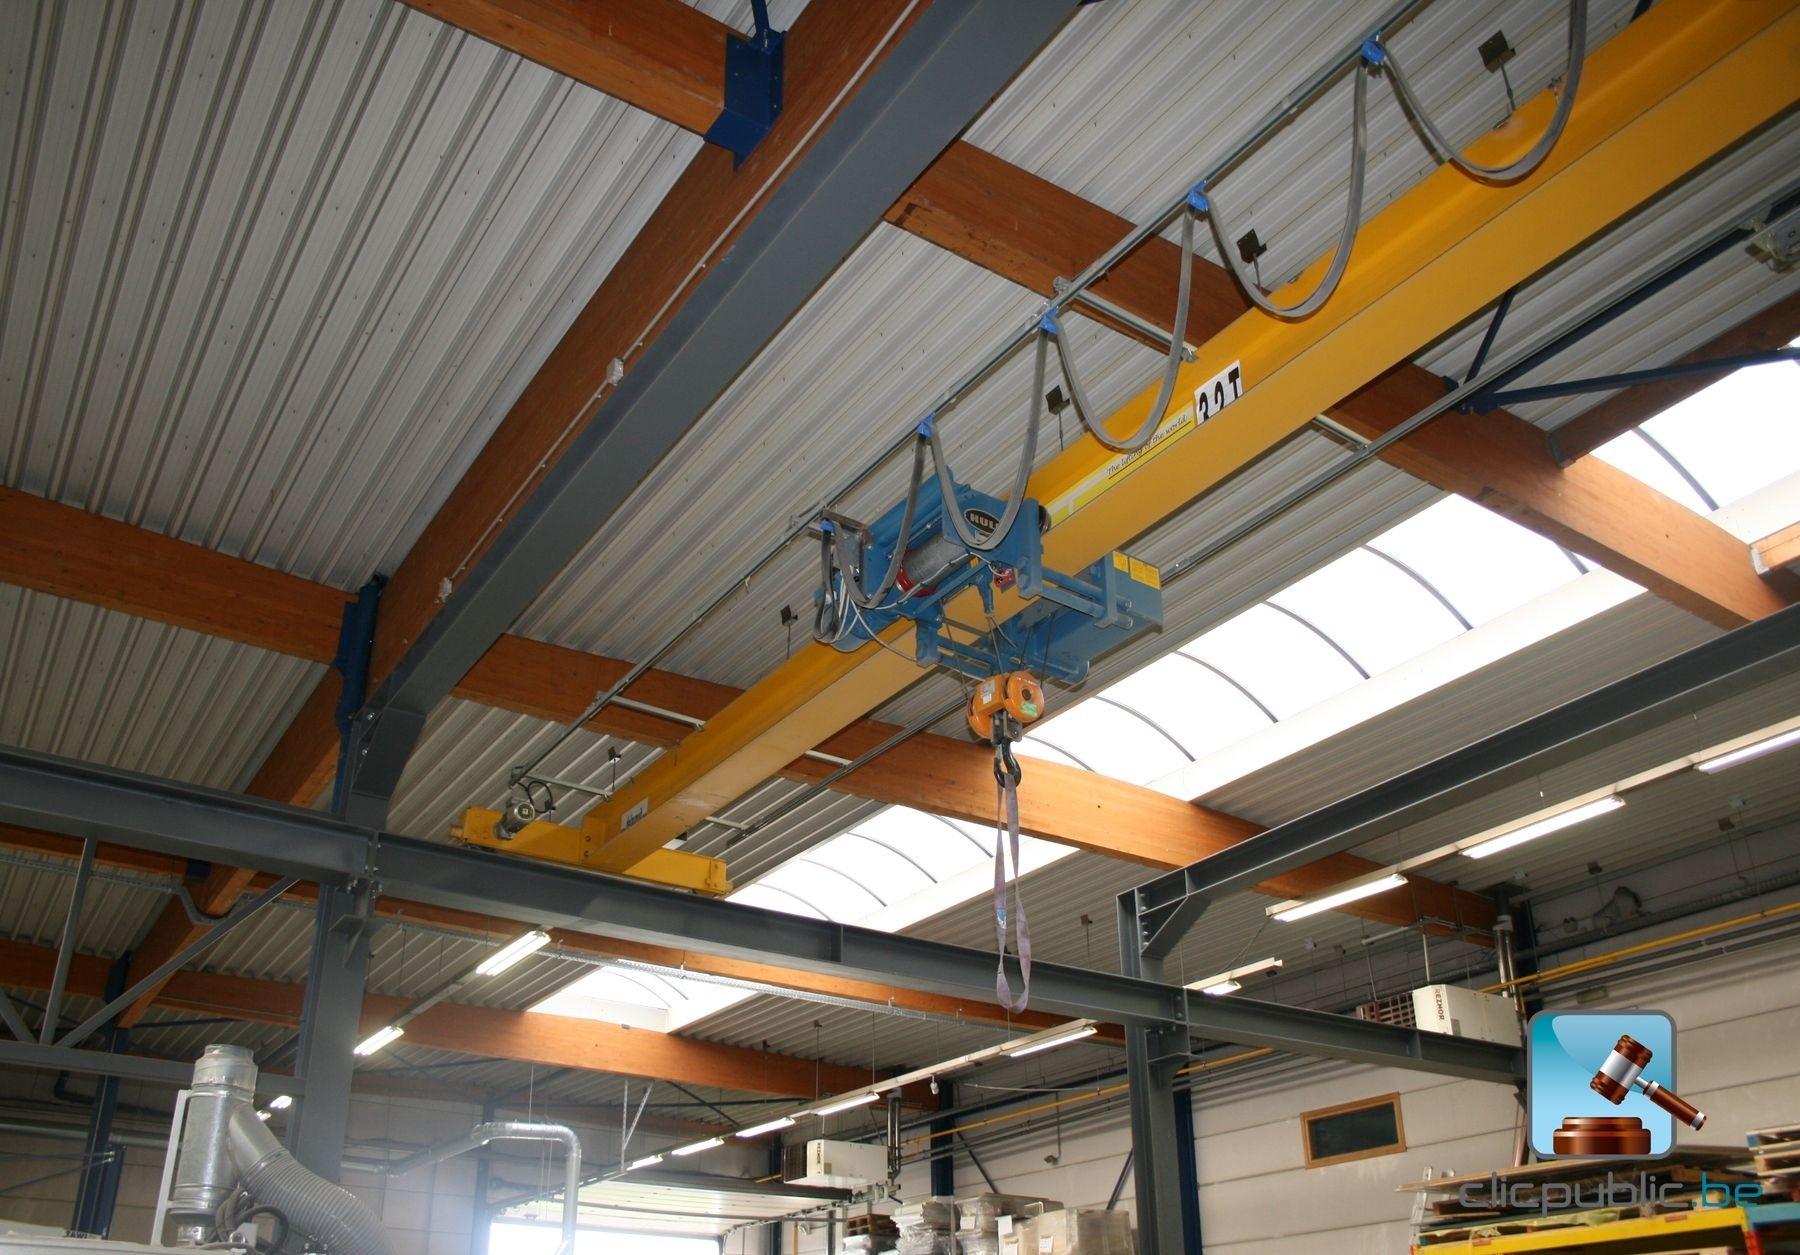 Overhead Crane Failure : Bridge crane single girder delaunoit on sale